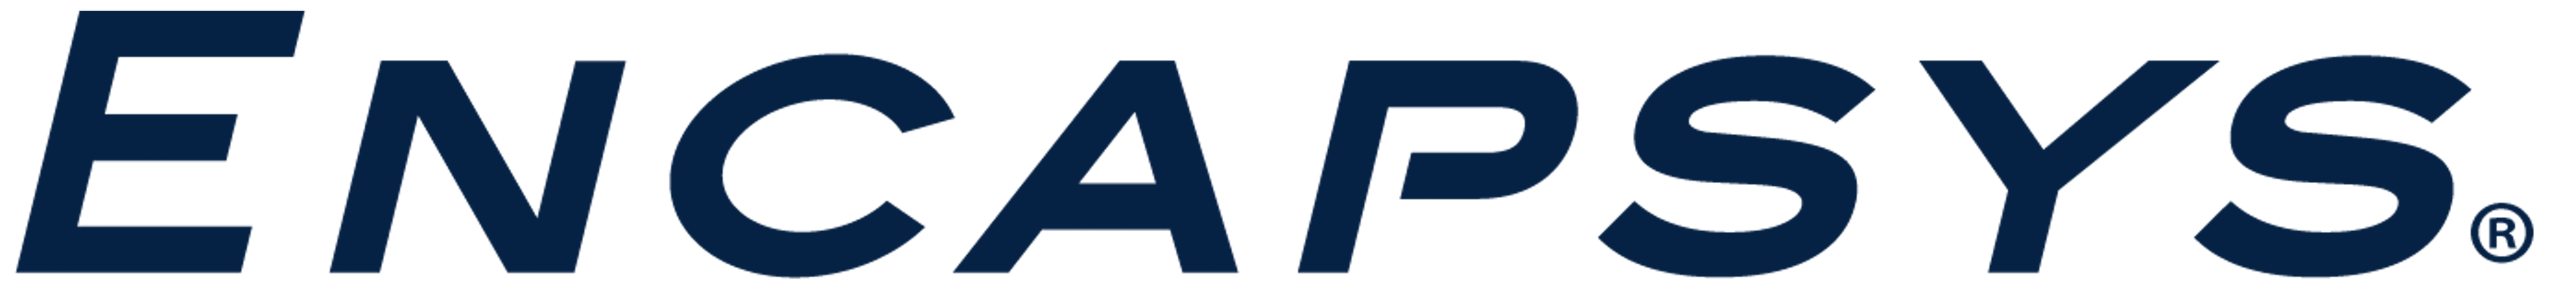 Encapsys_Logo_Plain